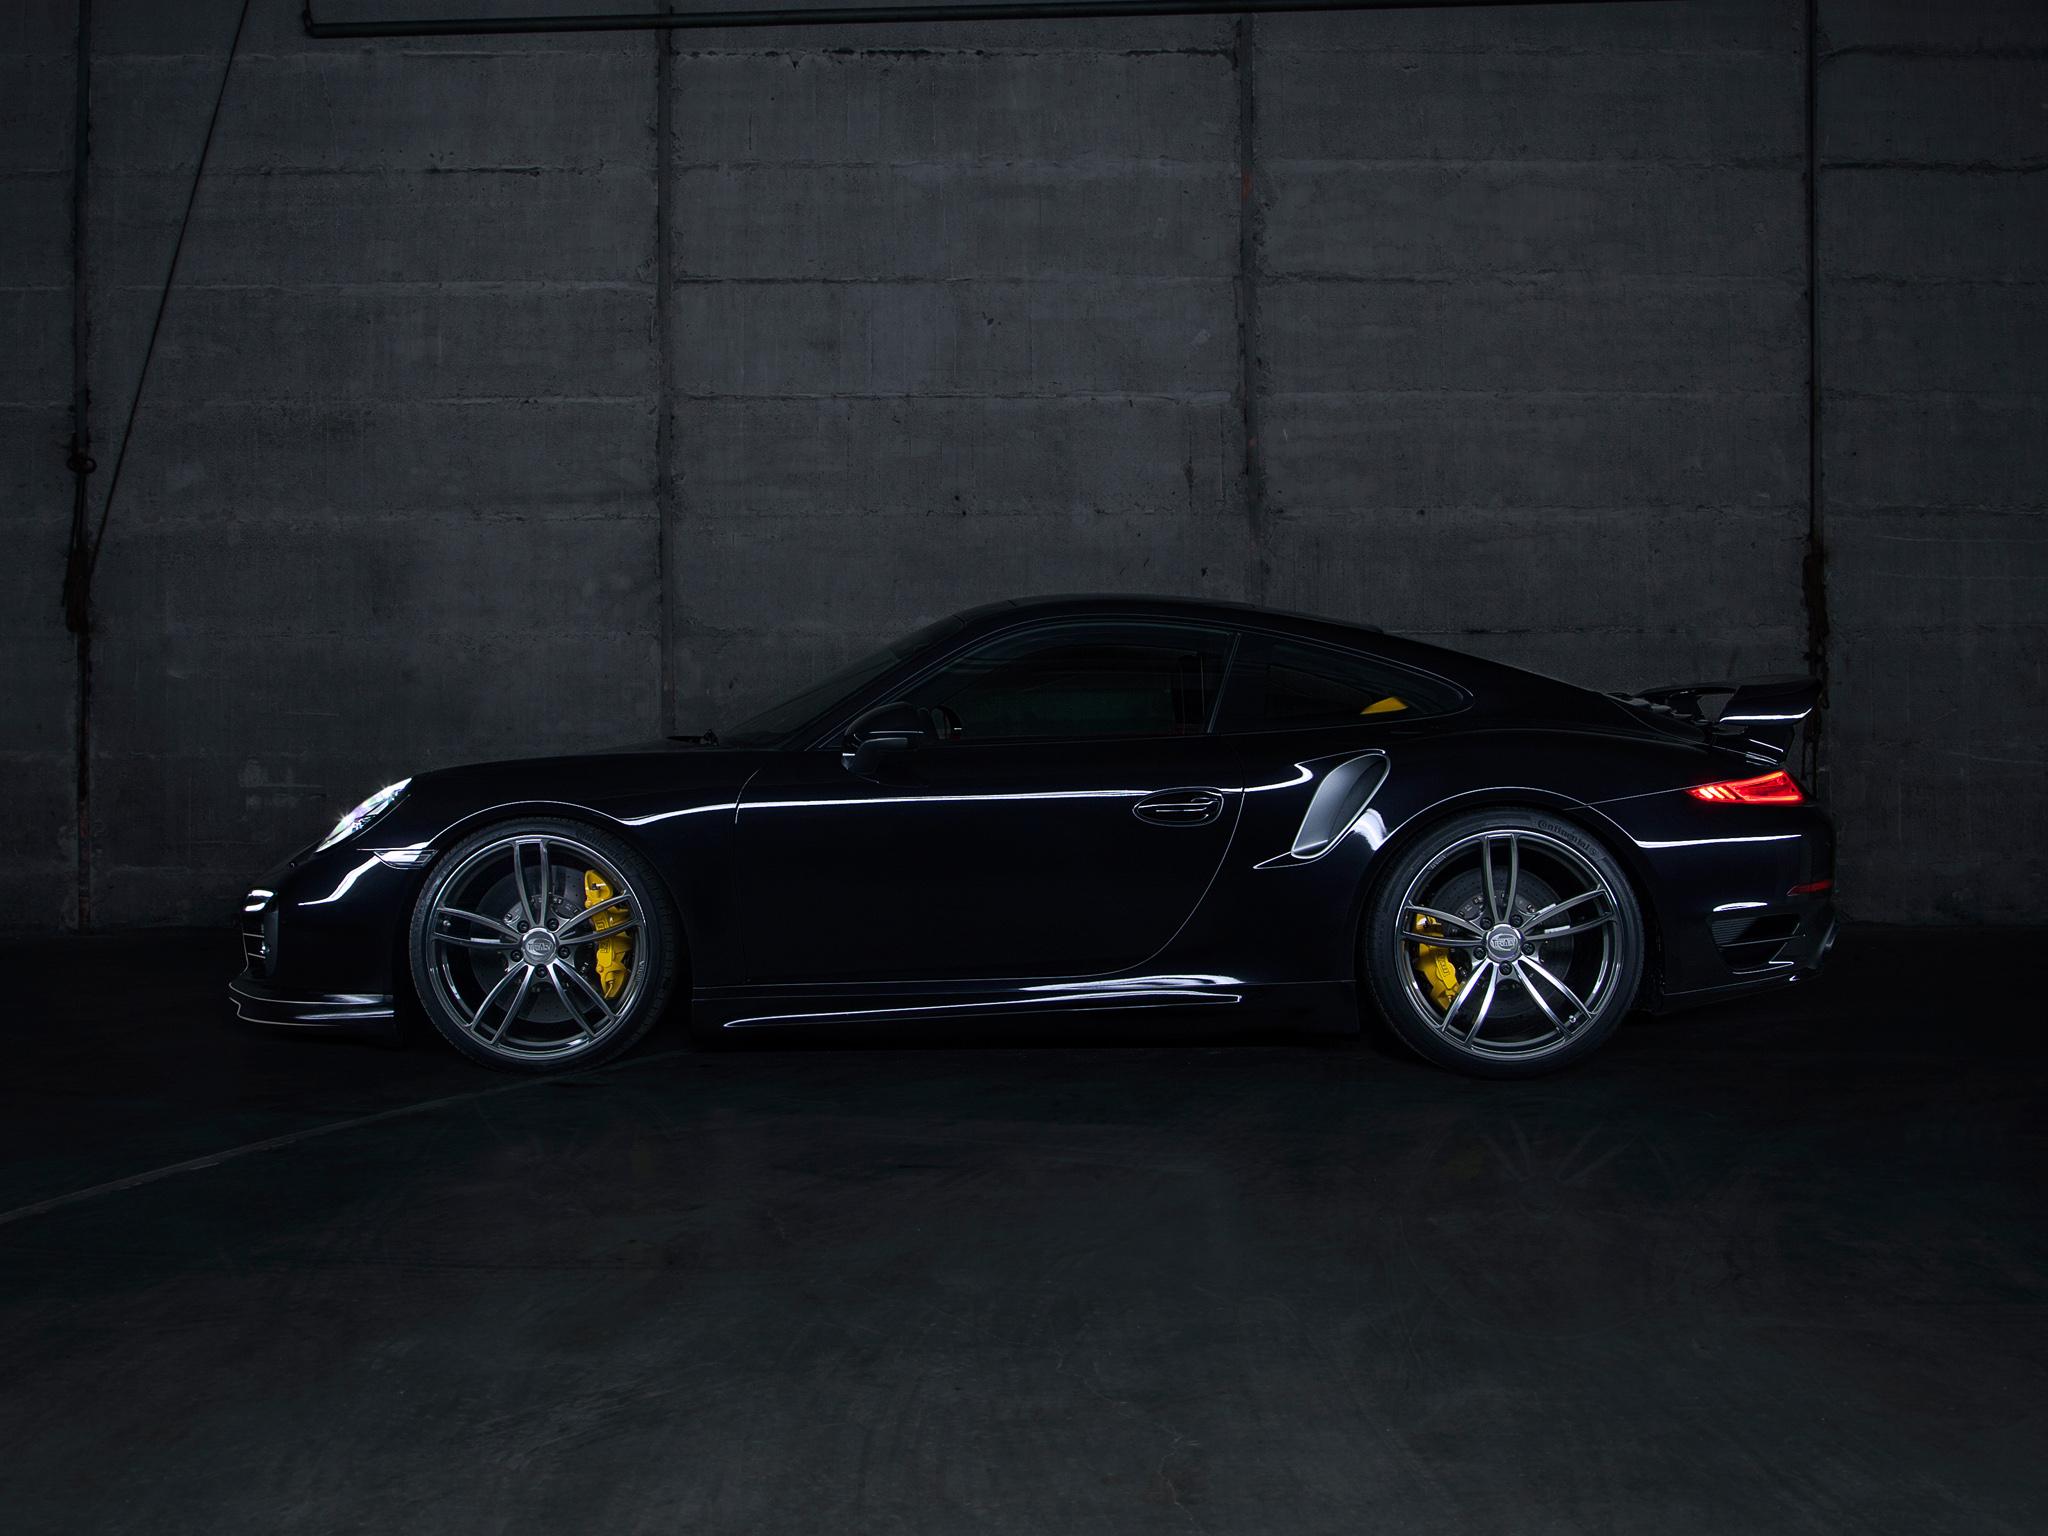 Black Porsche 911 Turbo Wallpaper